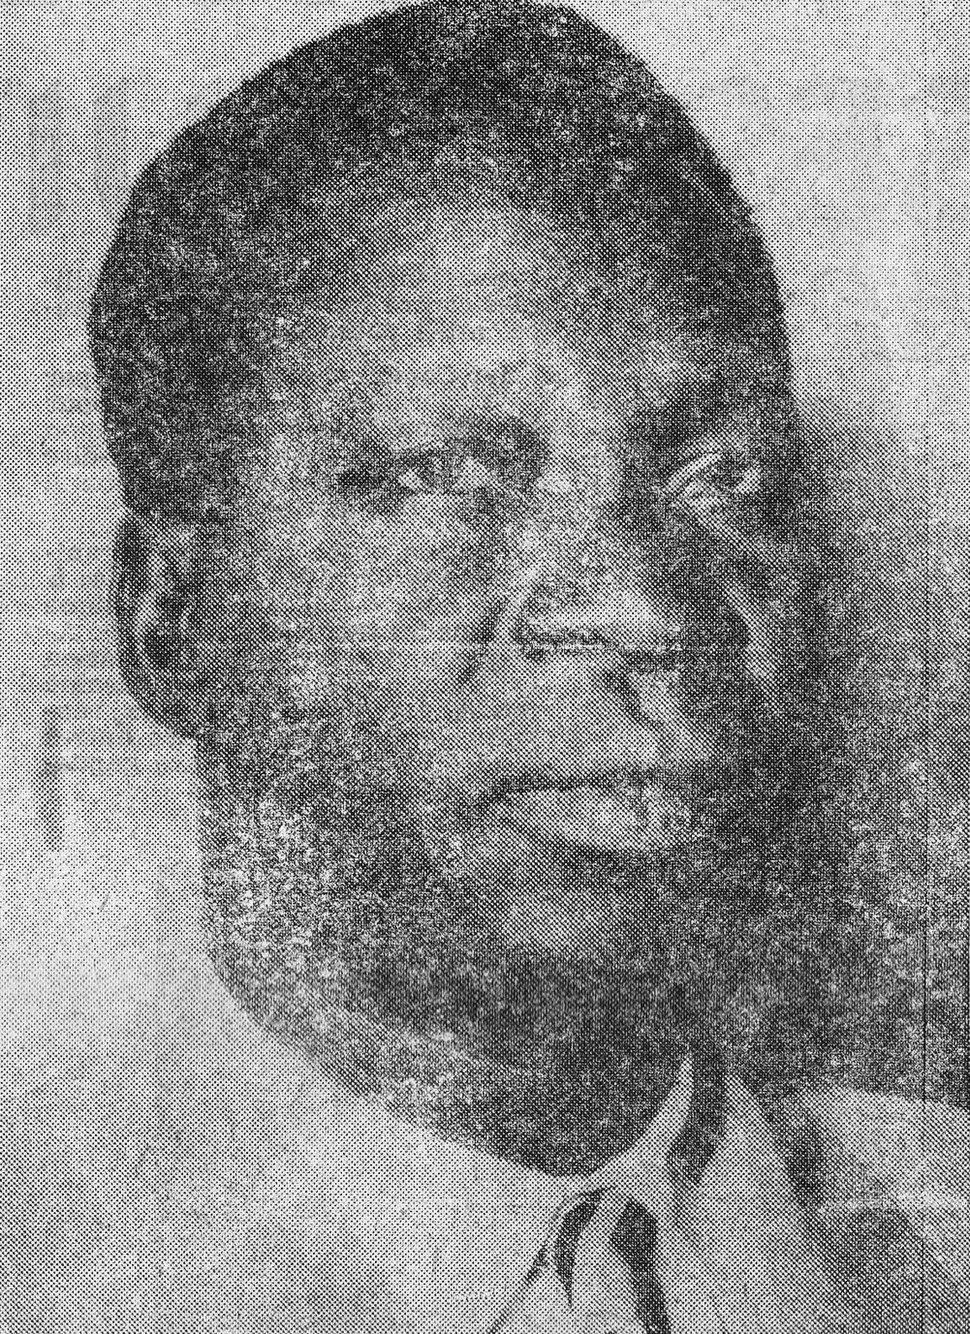 Sourou Migan Apithy in 1958